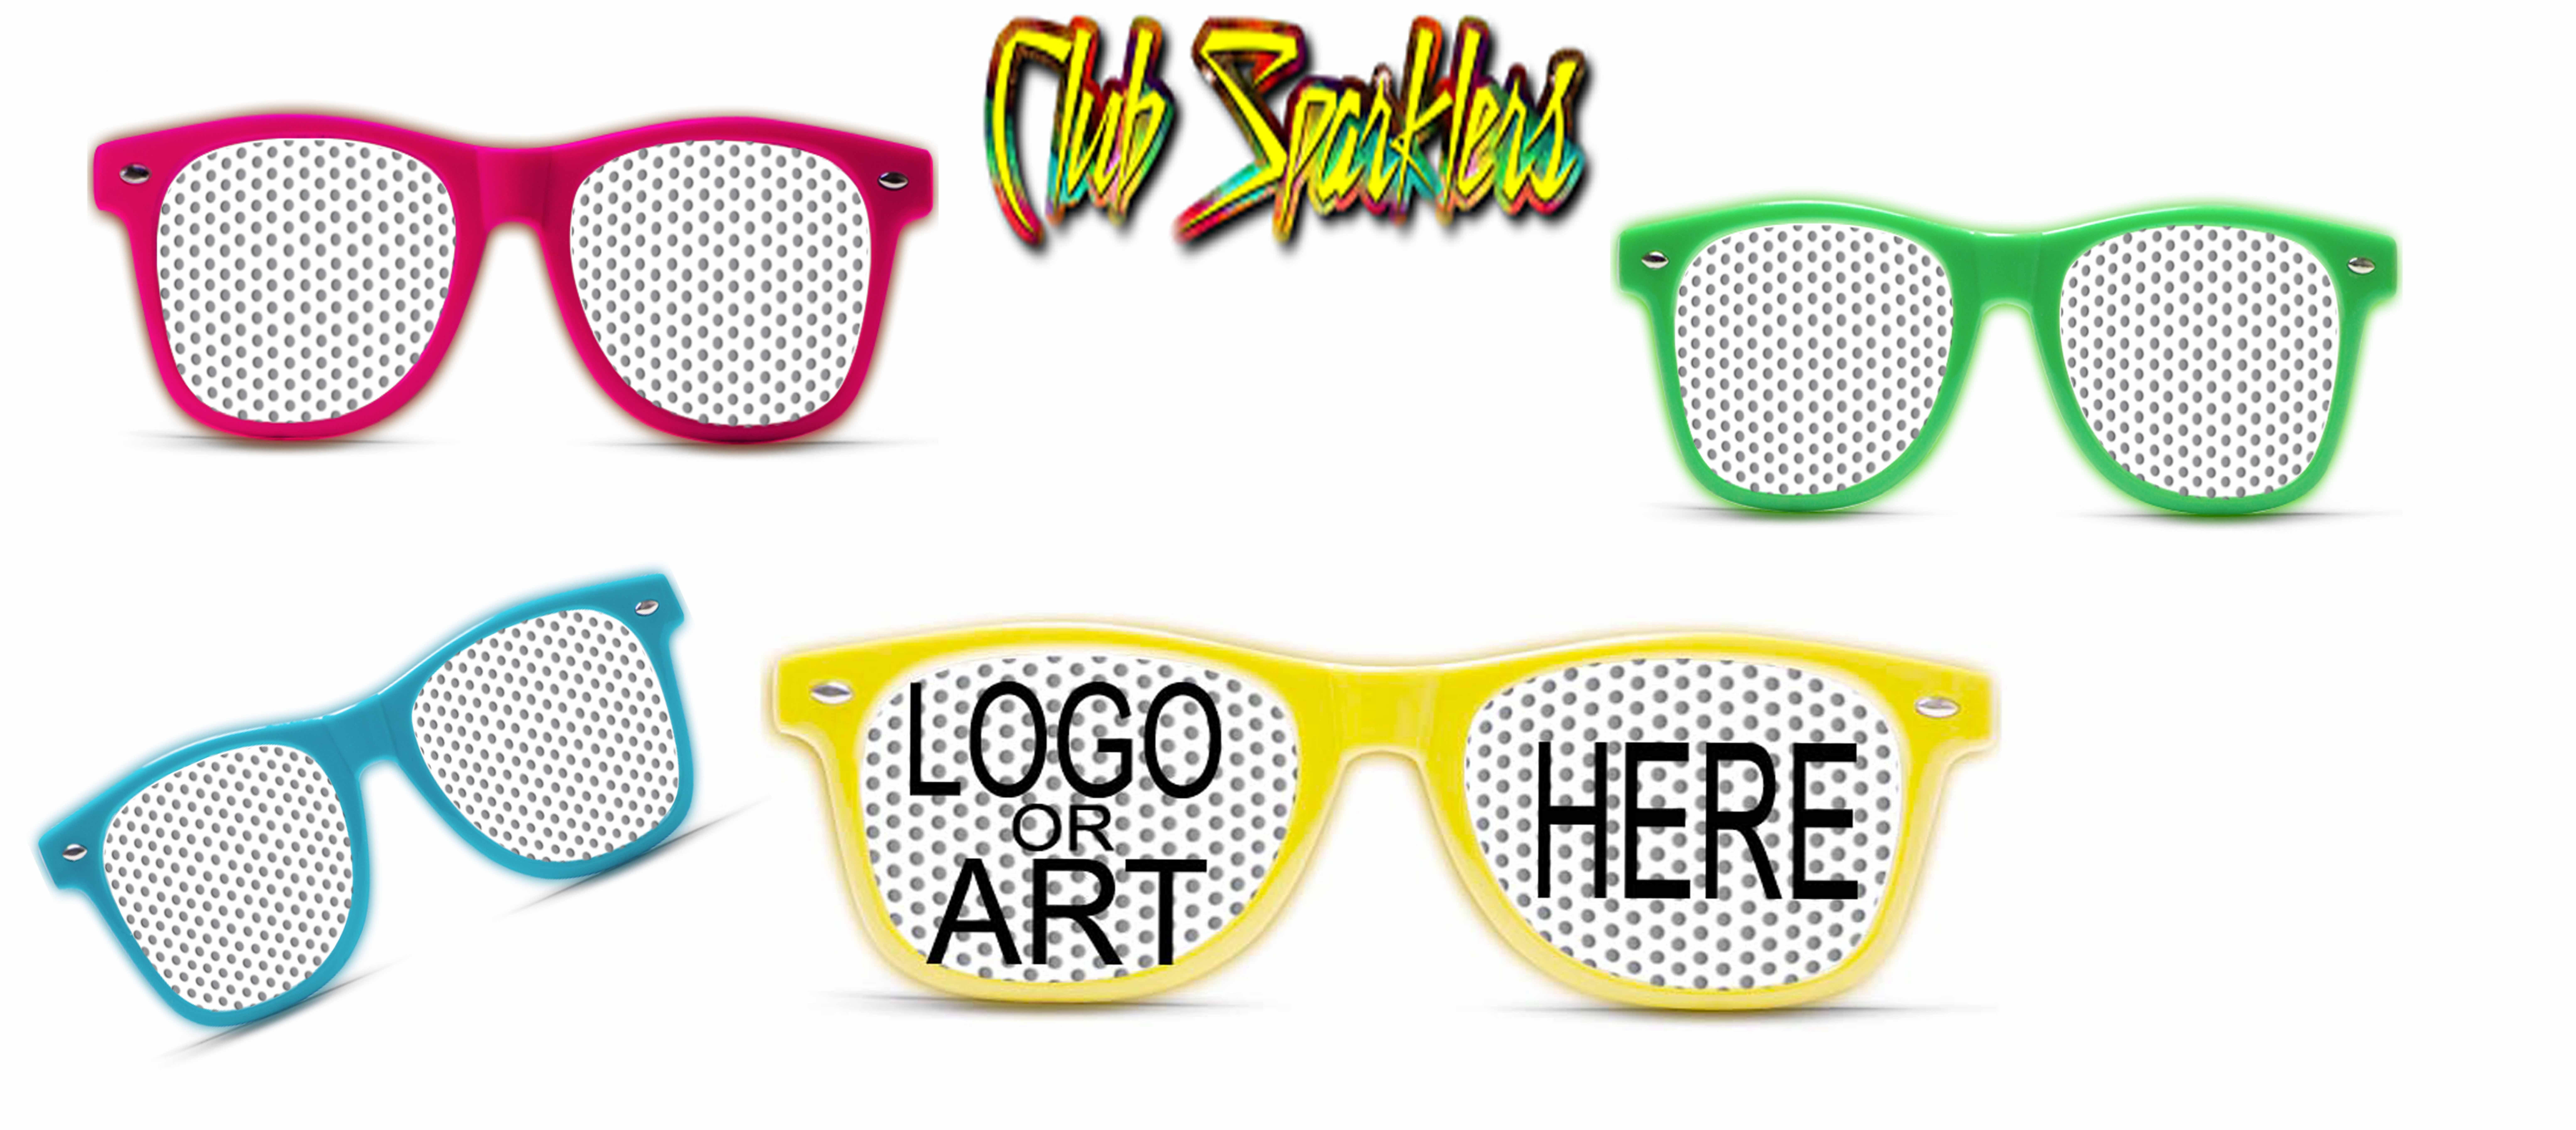 sunglasses-logo-glow-frames-print-wayfarer-custom.jpg